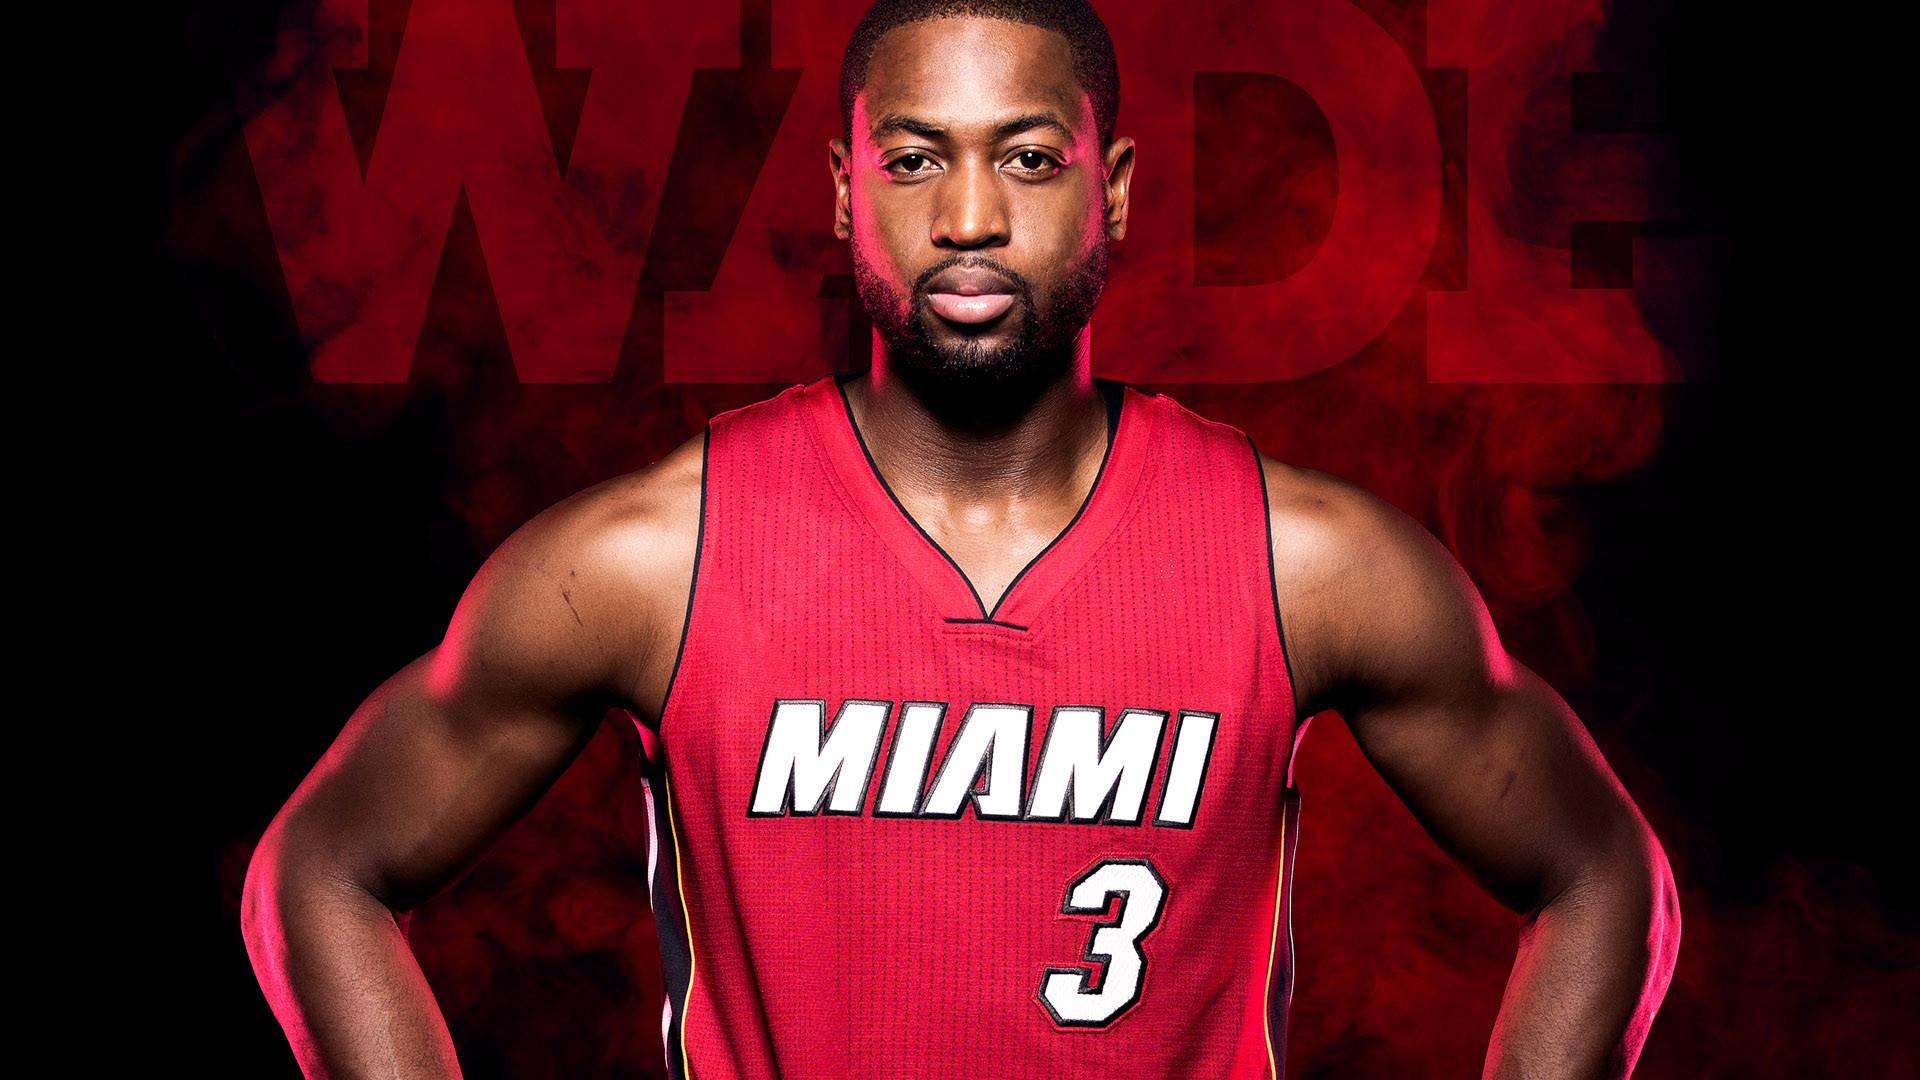 Dwyane Wade Miami Heat Players Wallpaper .